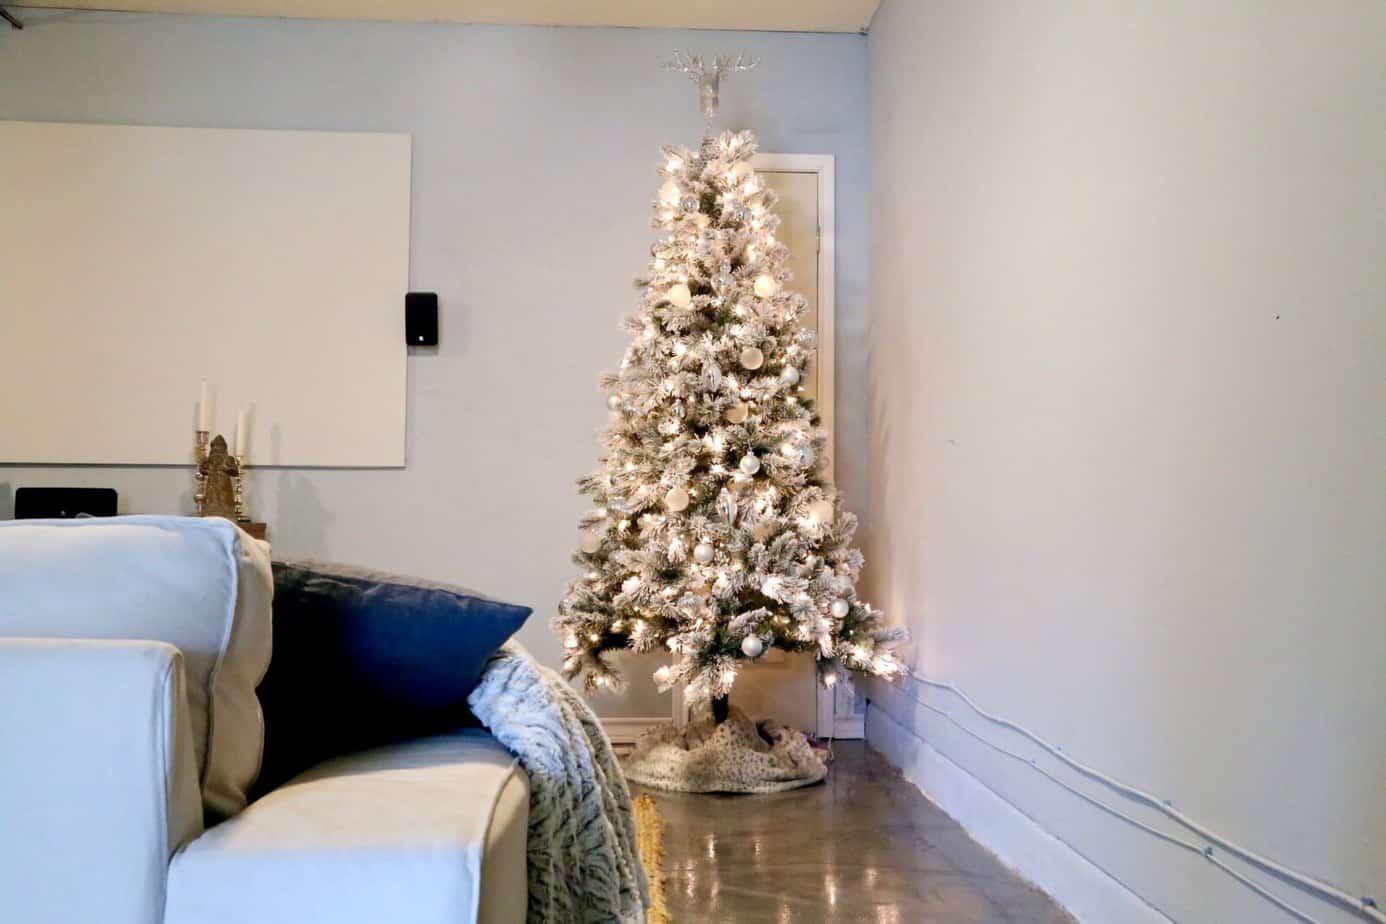 Big Lots Christmas decorations